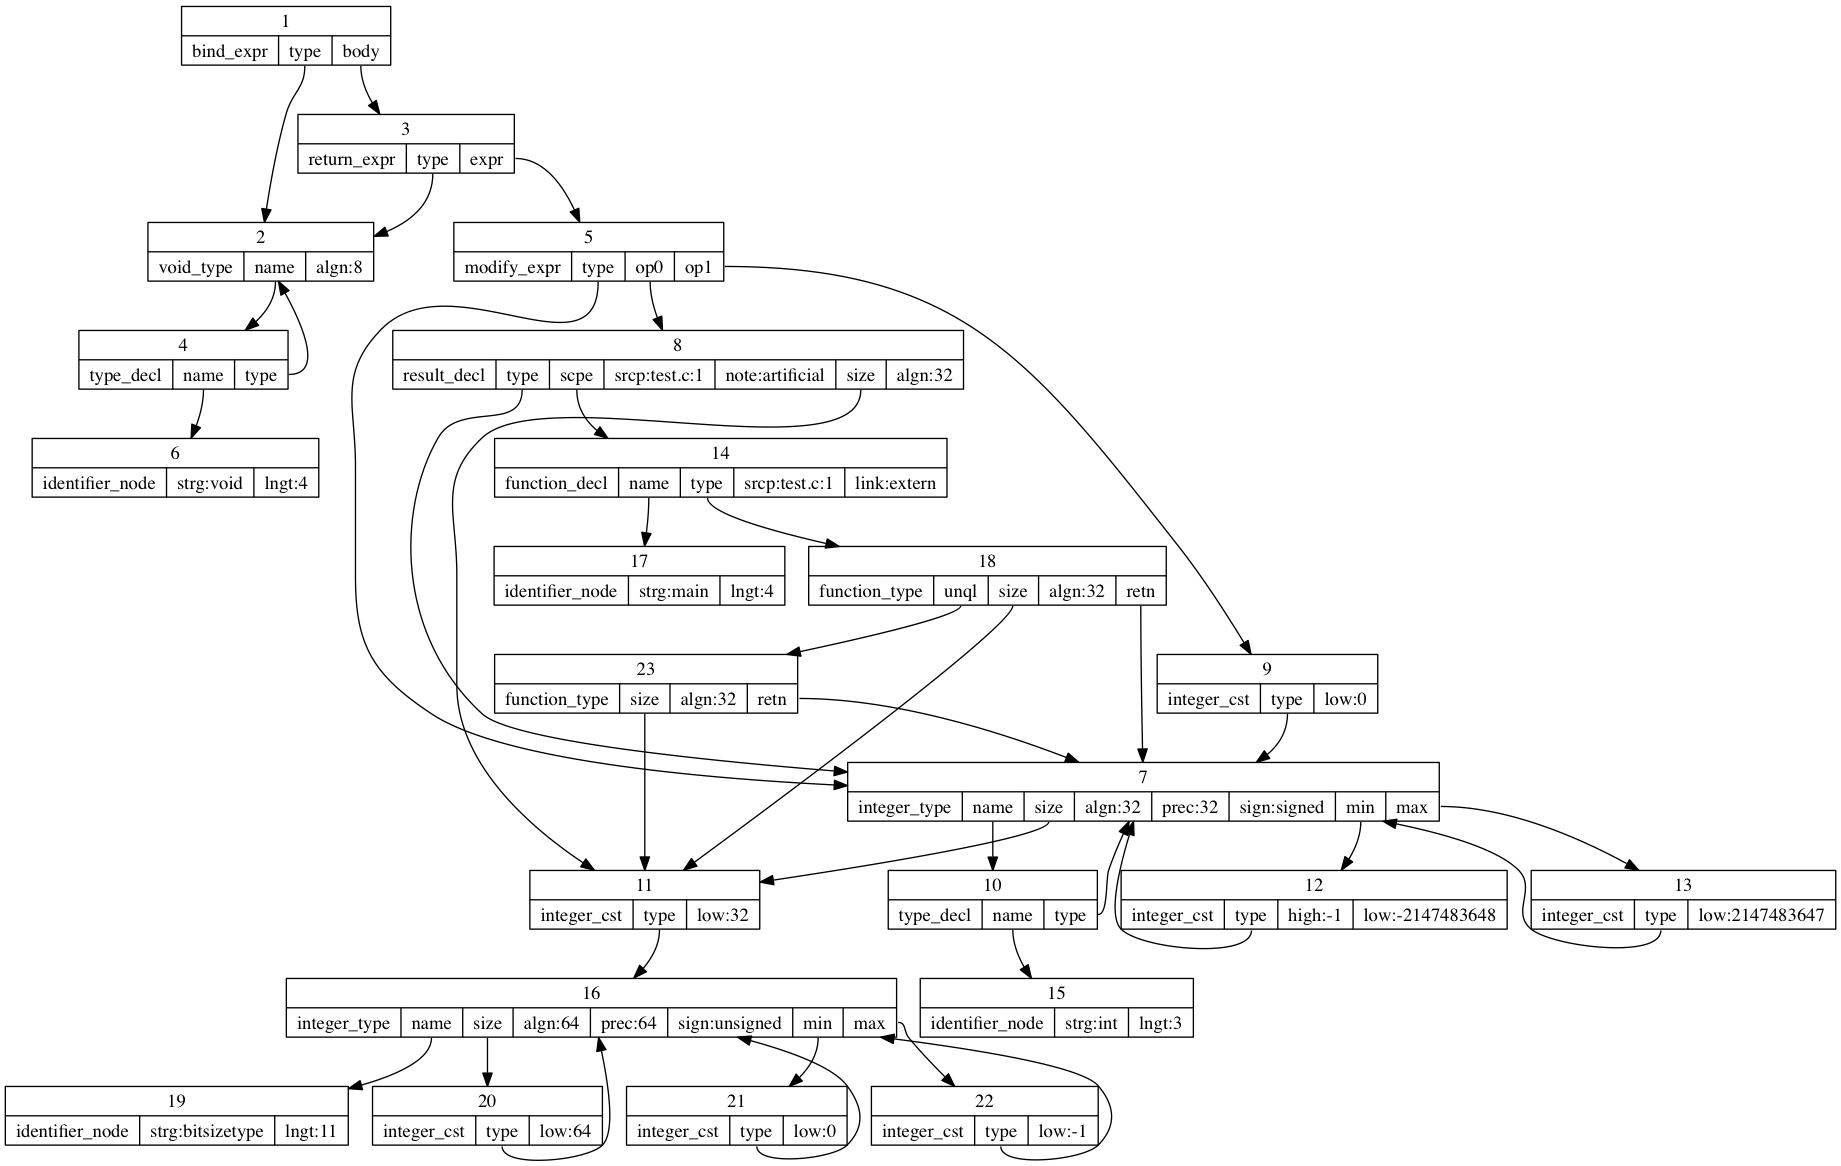 GCC treeの視覚化 - Qiita